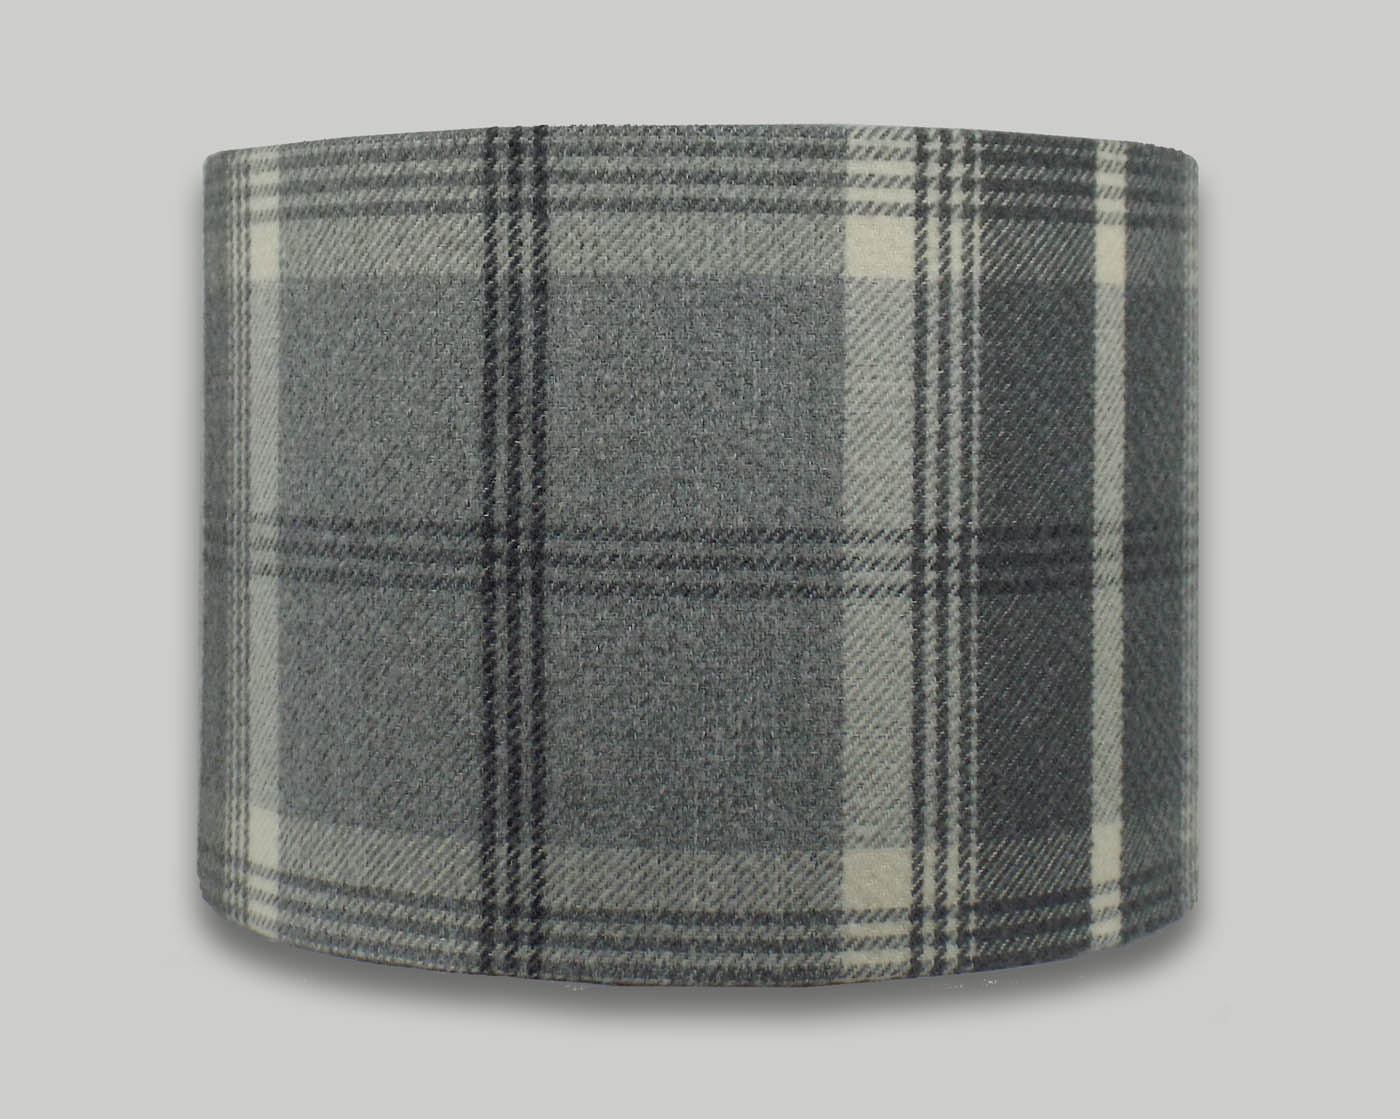 Balmoral dove grey tartan check tweed drum lampshade the balmoral dove grey tartan check tweed drum lampshade aloadofball Choice Image